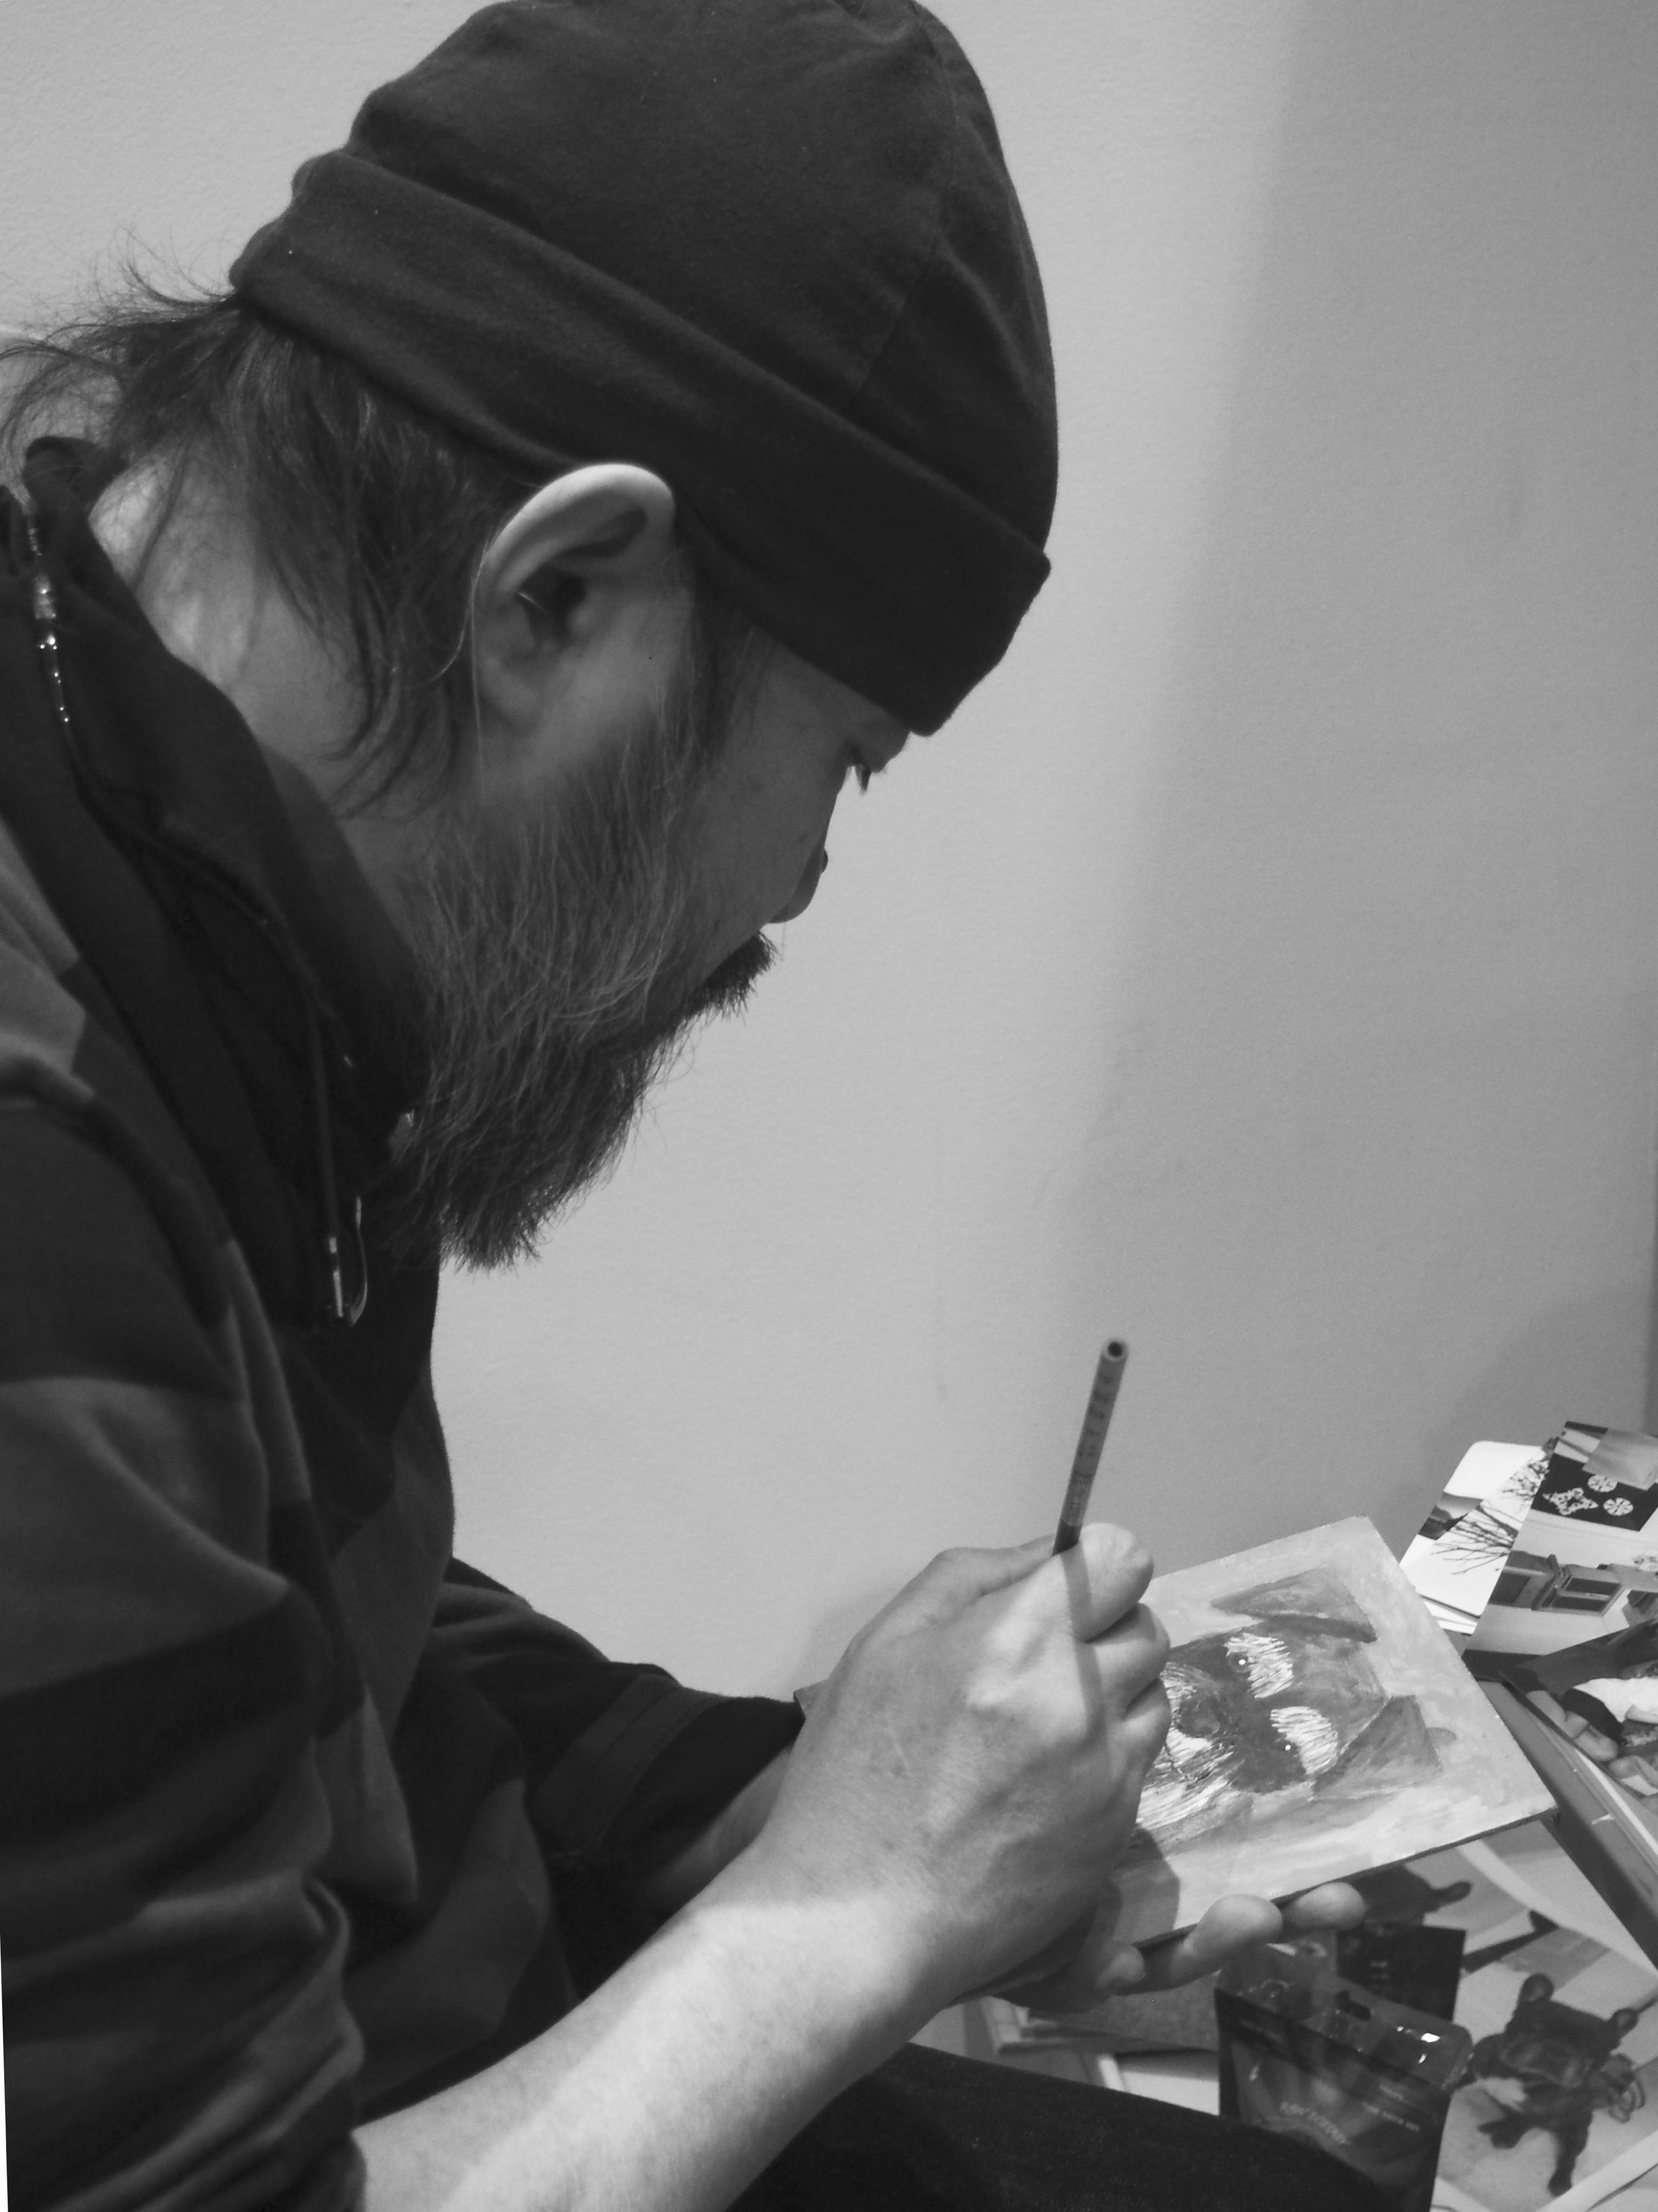 Tetsuo portrait